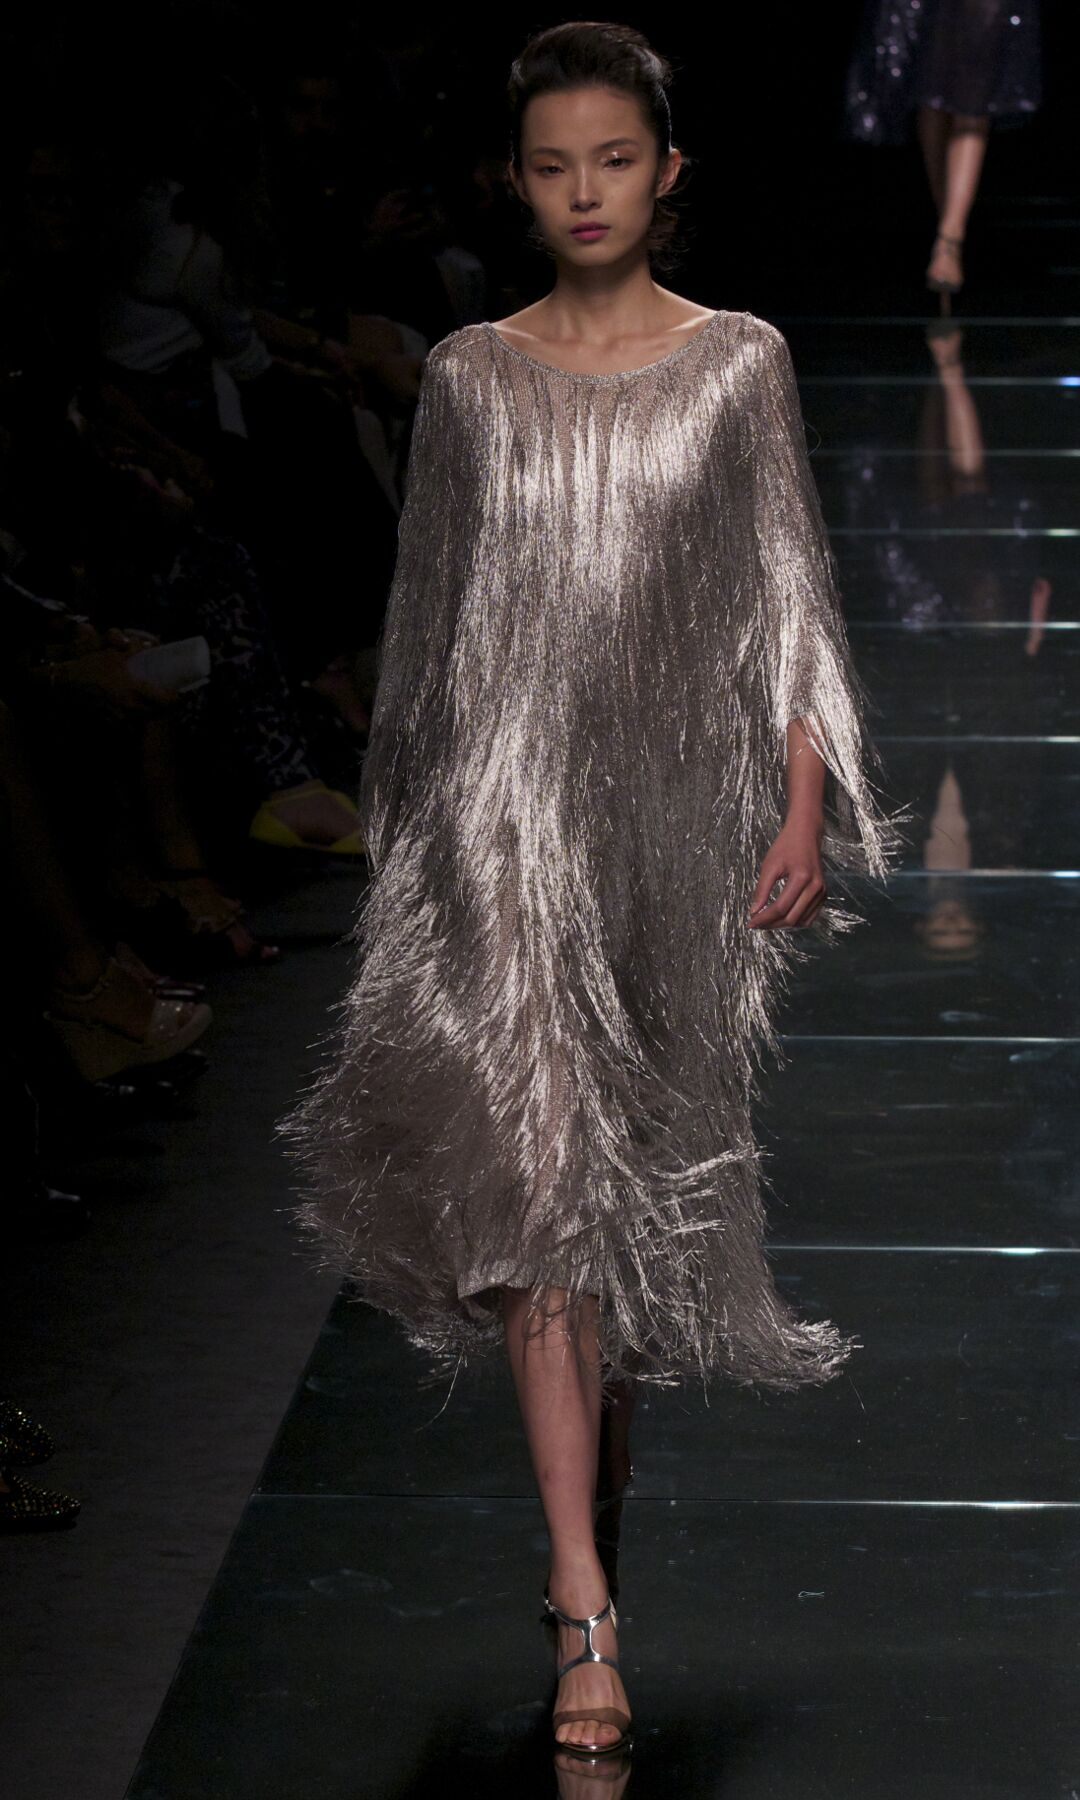 Anteprima Catwalk Fashion Trends Milan Fashion Show Milano Fashion Week